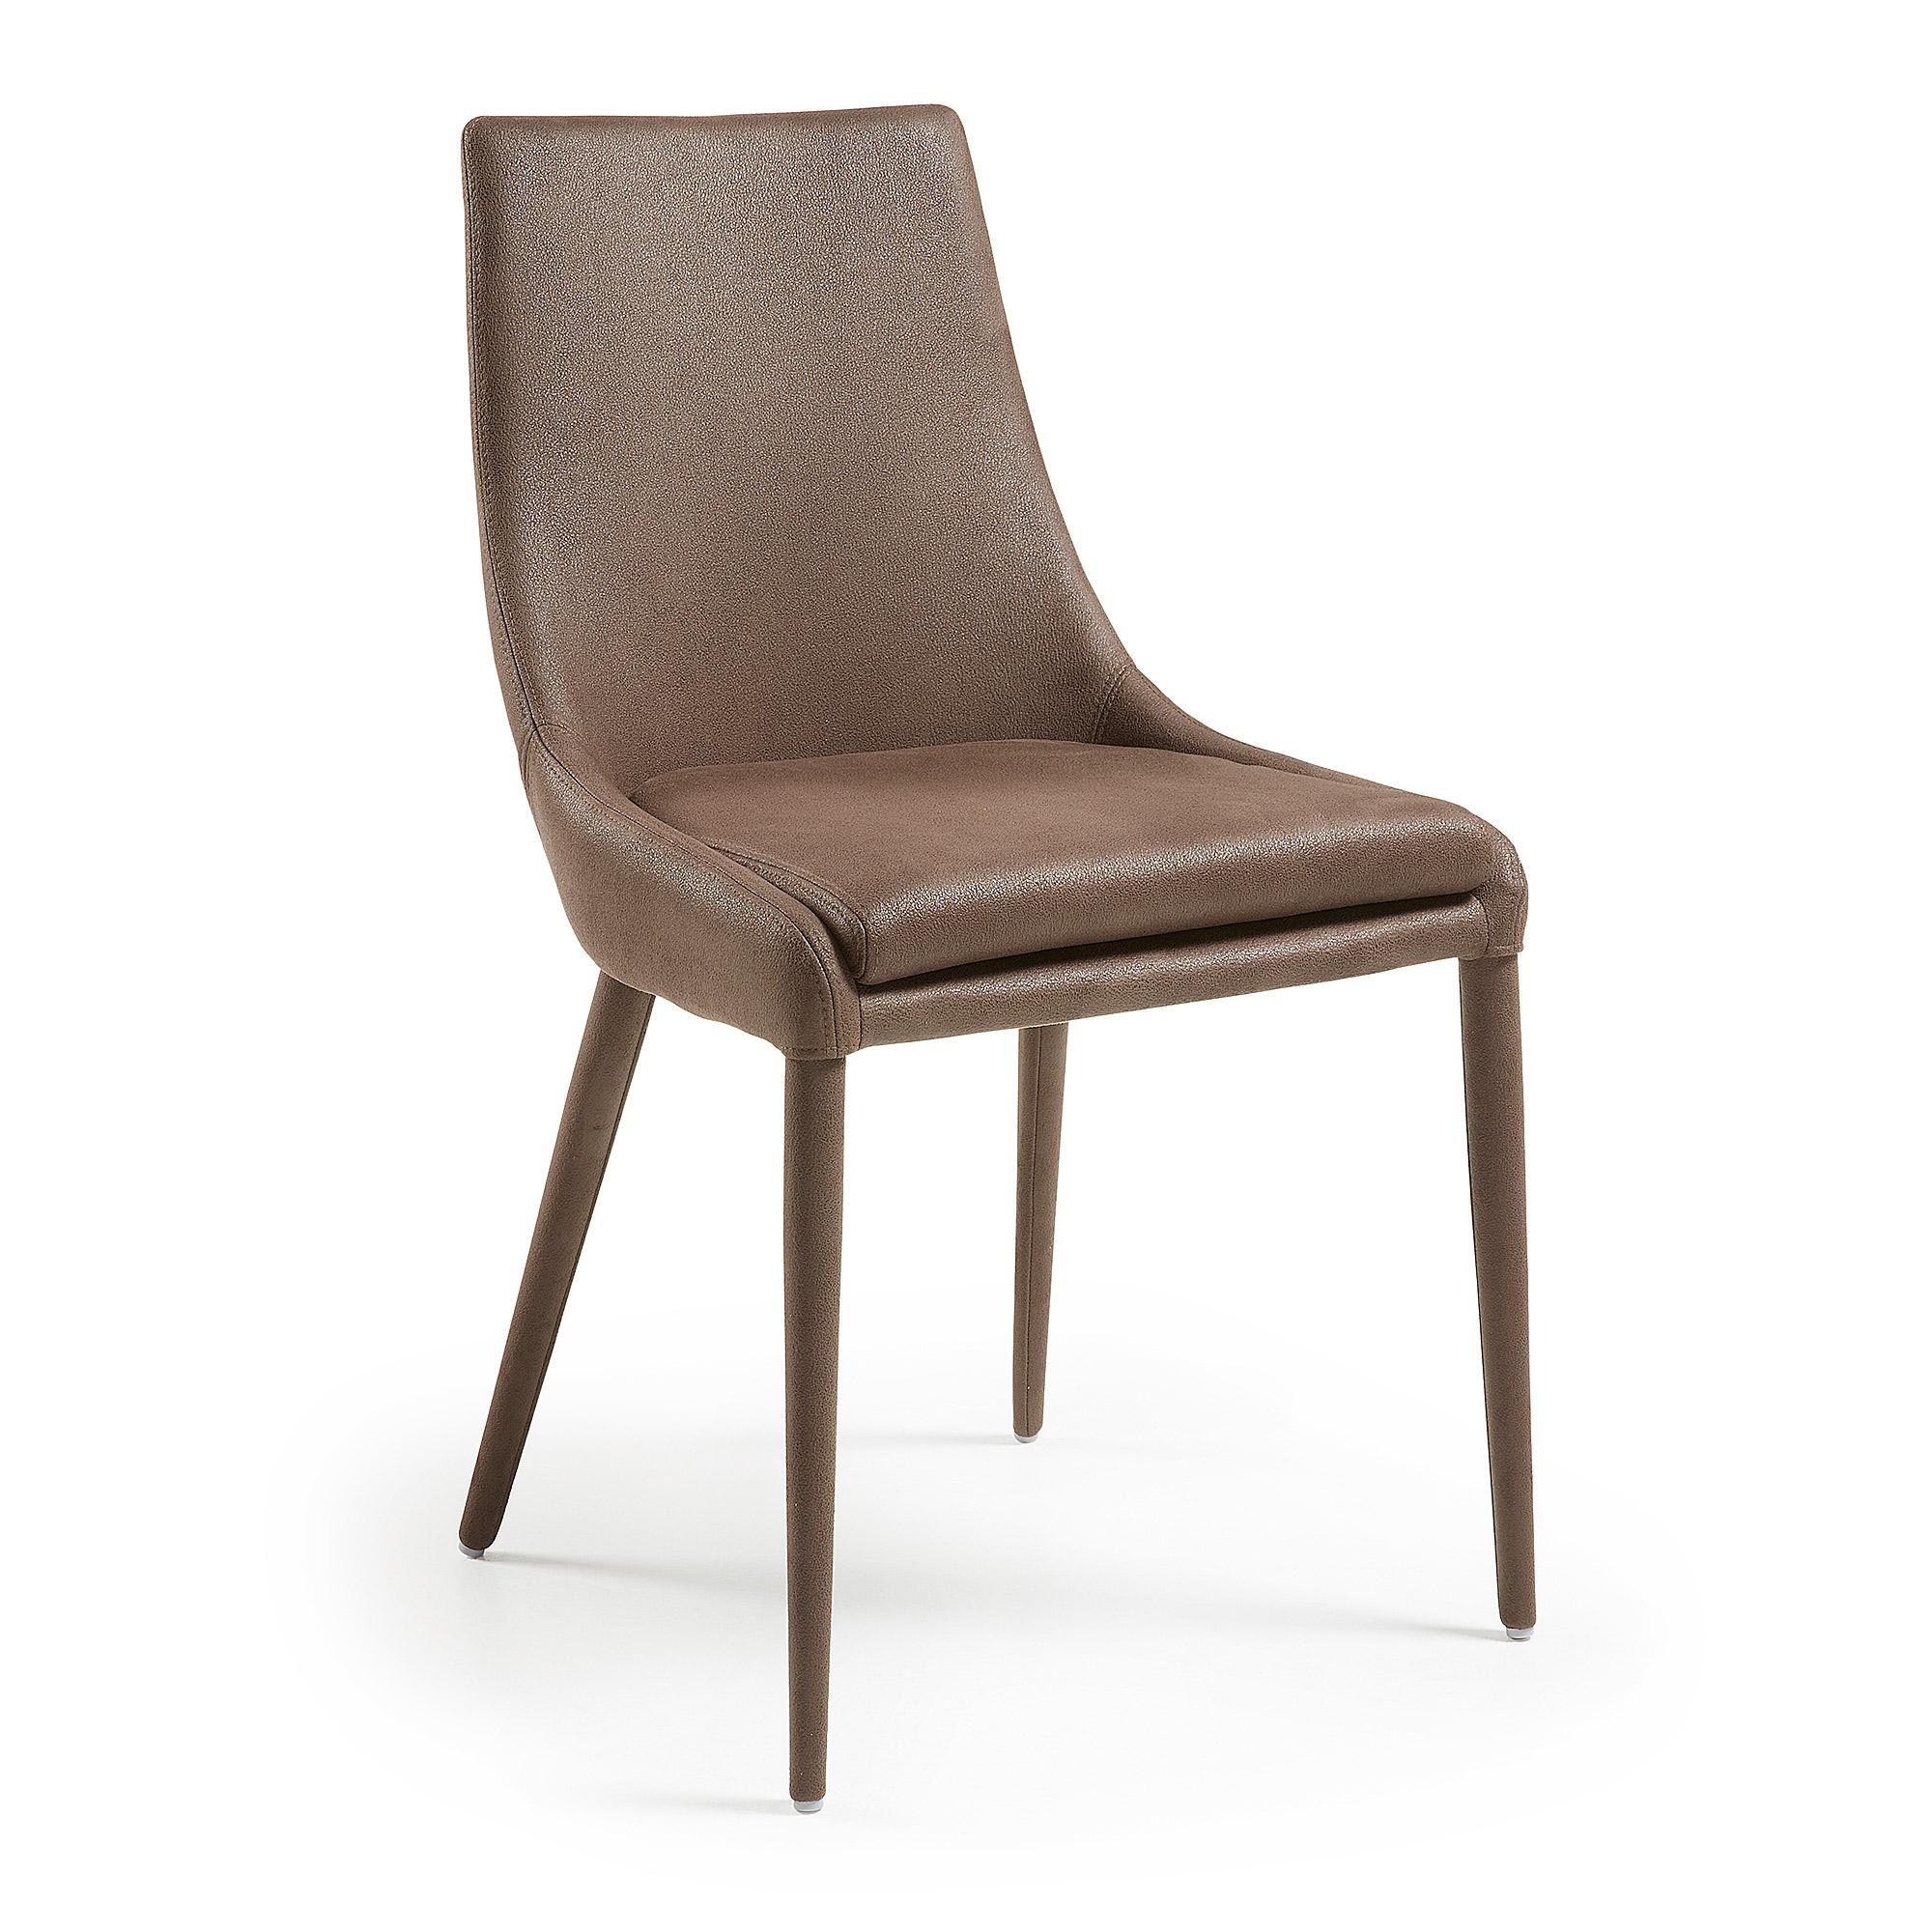 Kave home - chaise davi marron